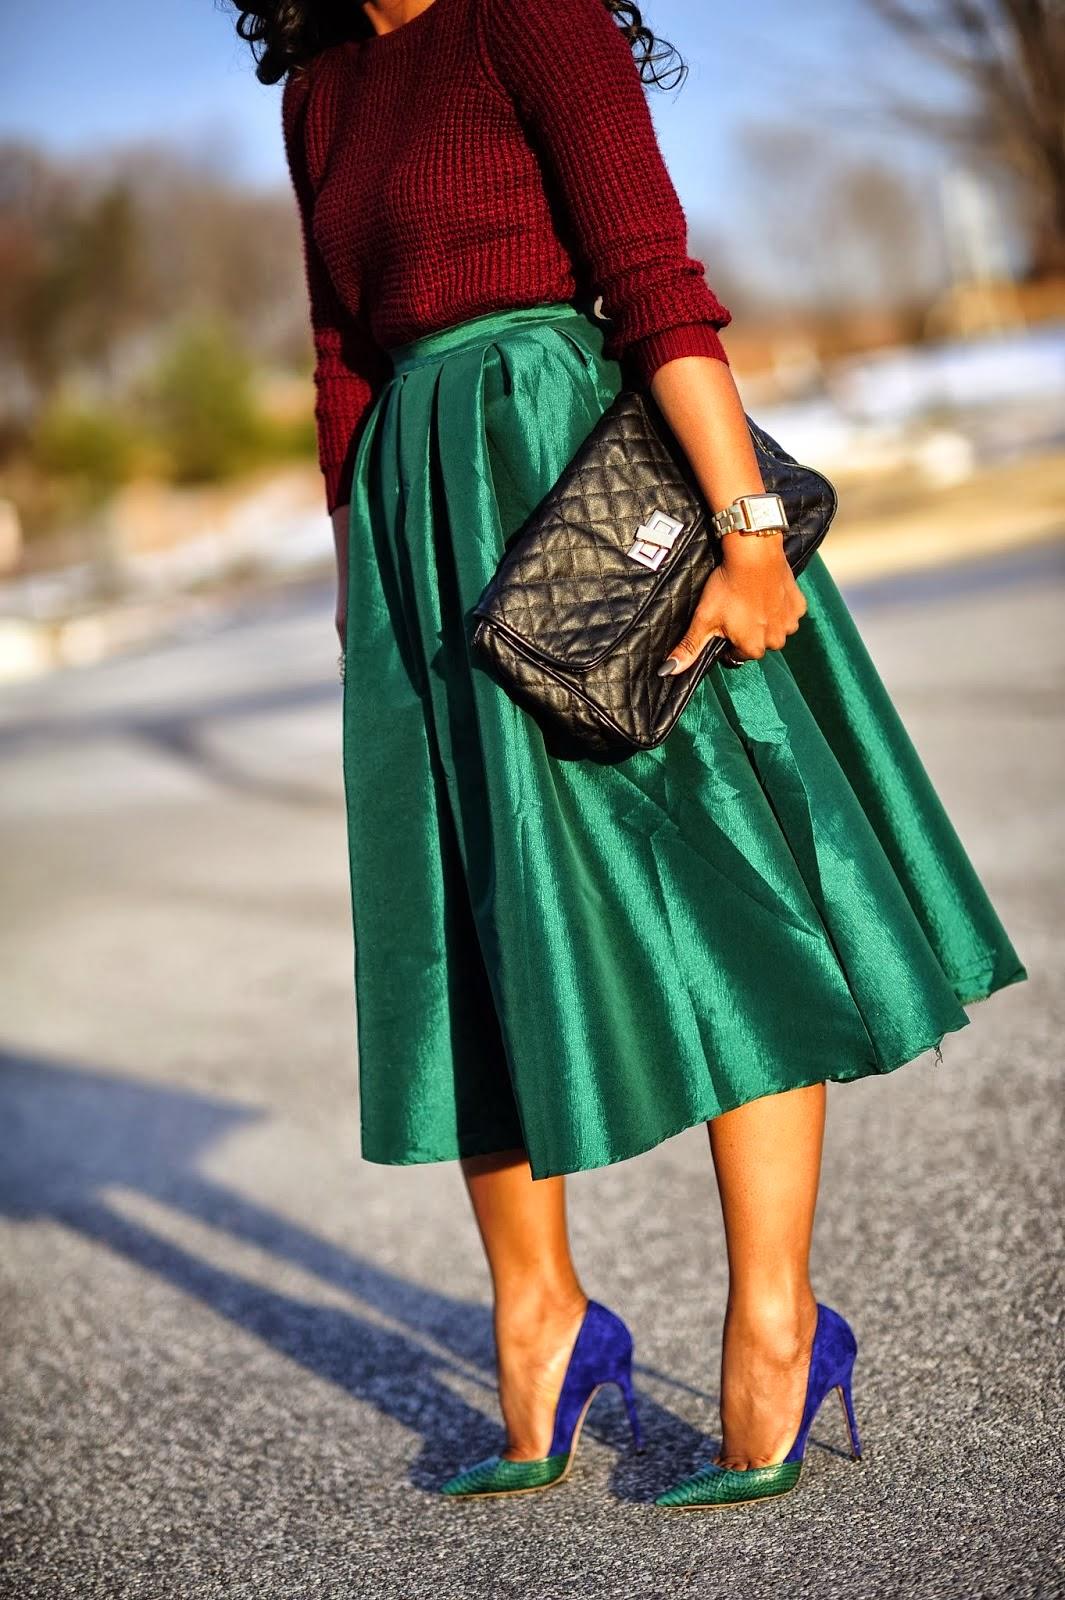 Фото Юбки Мода Доставка